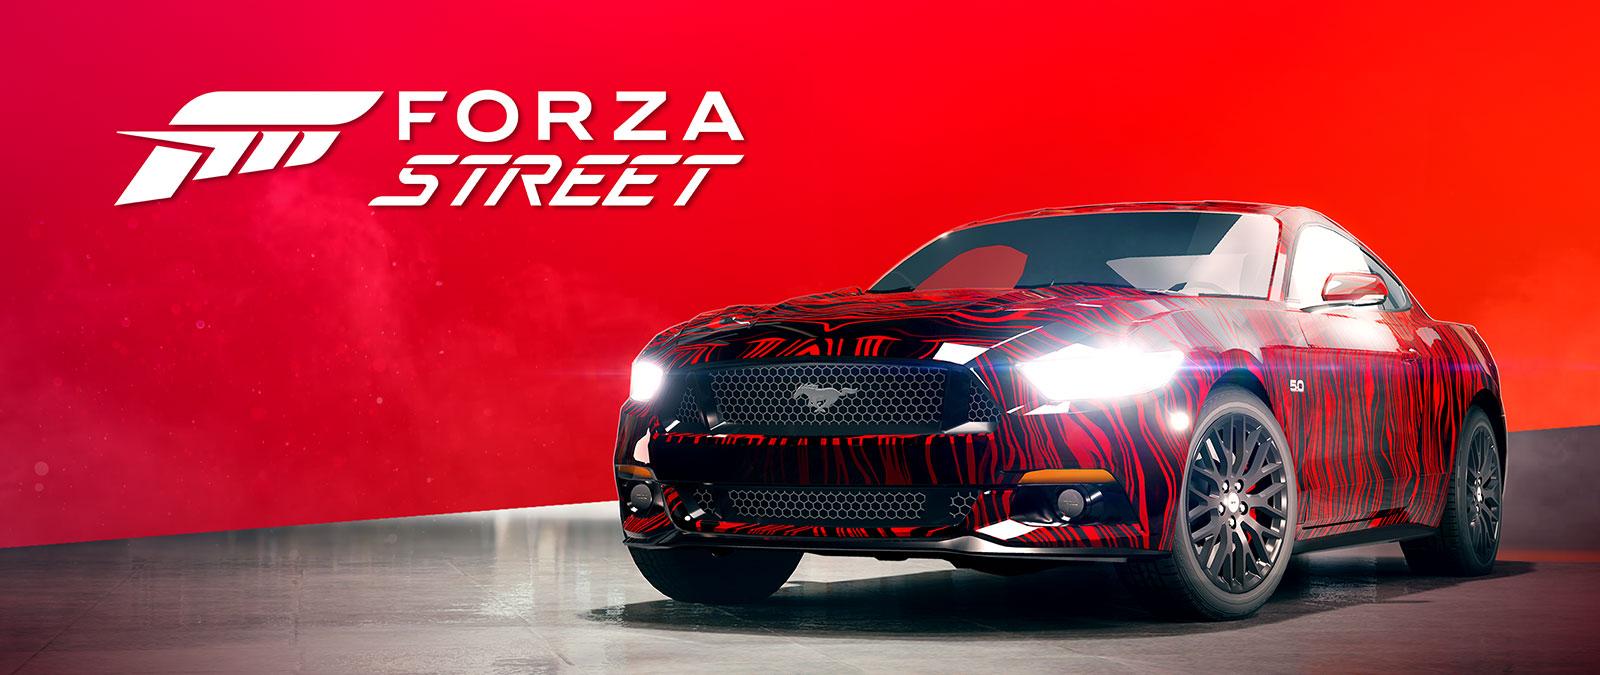 Logo de Forza Street, Ford Mustang 2015 avec peinture de galaxie